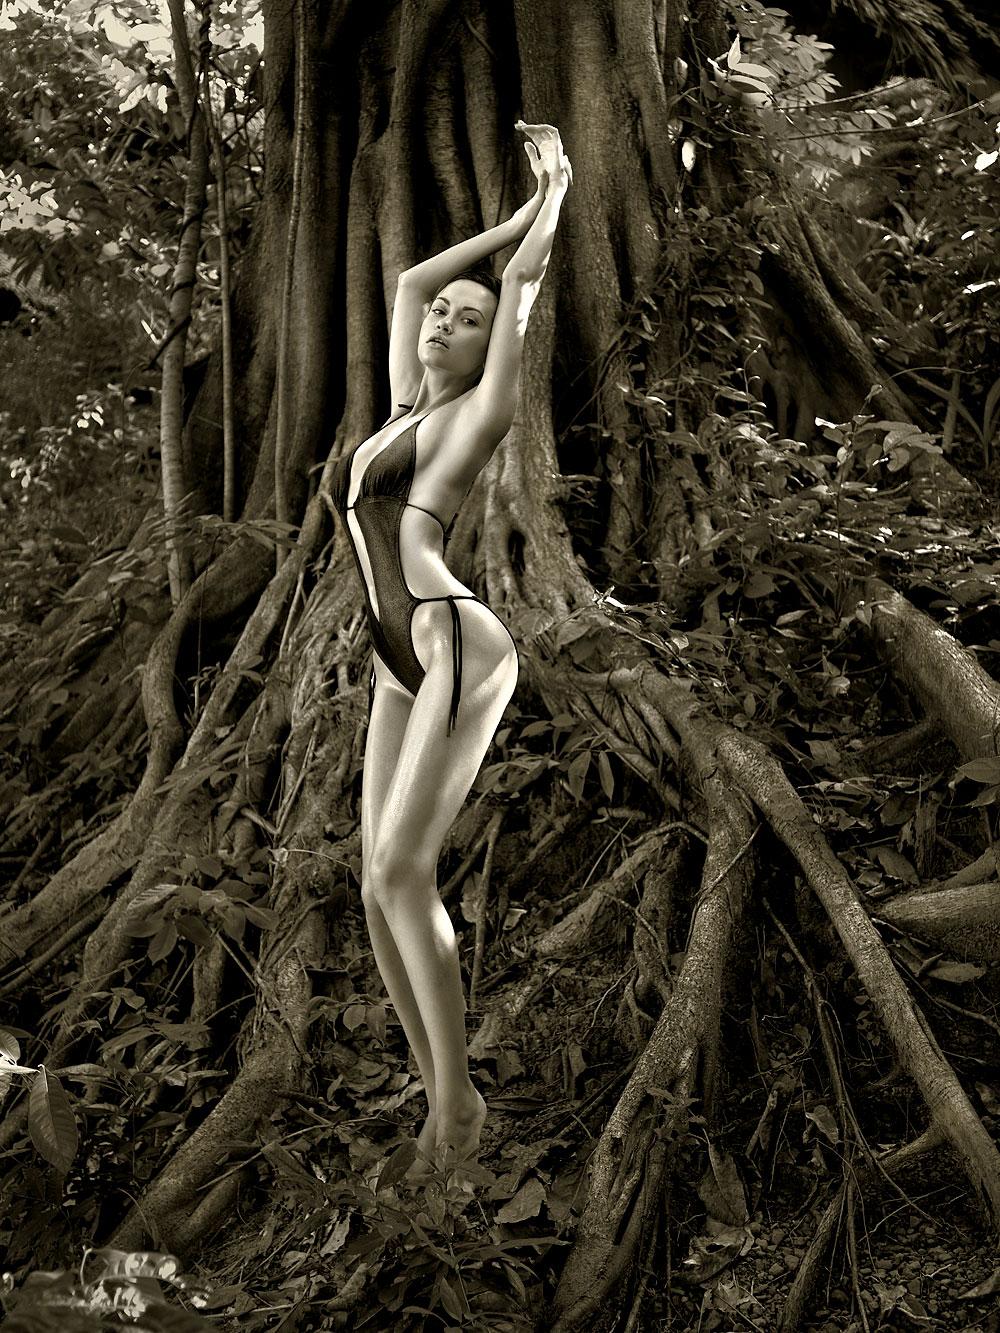 Heißes Bikinigirl im Wald